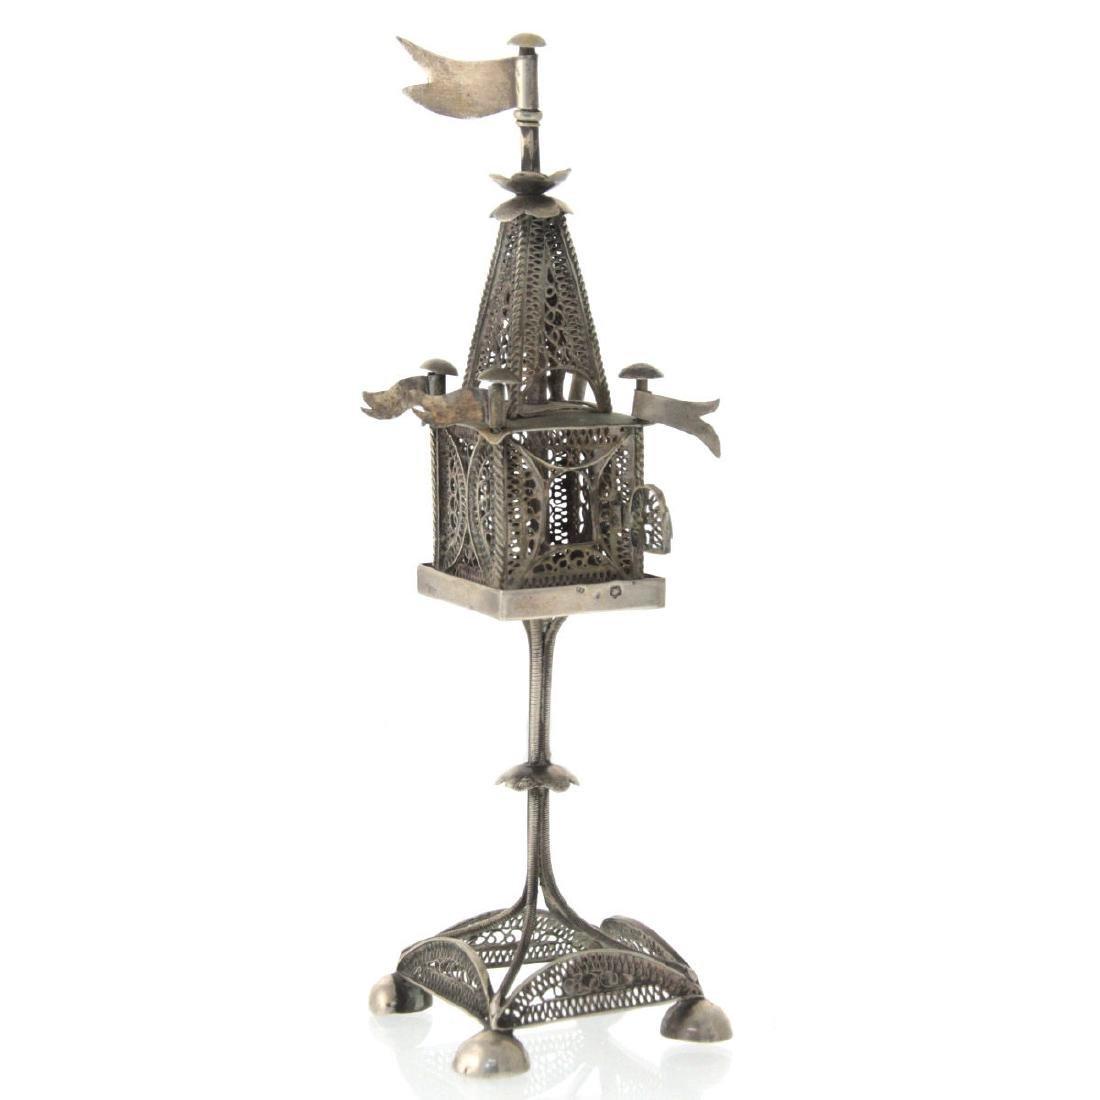 Silver Spice Tower Besamim, Vienna, Austro-Hungary, - 2